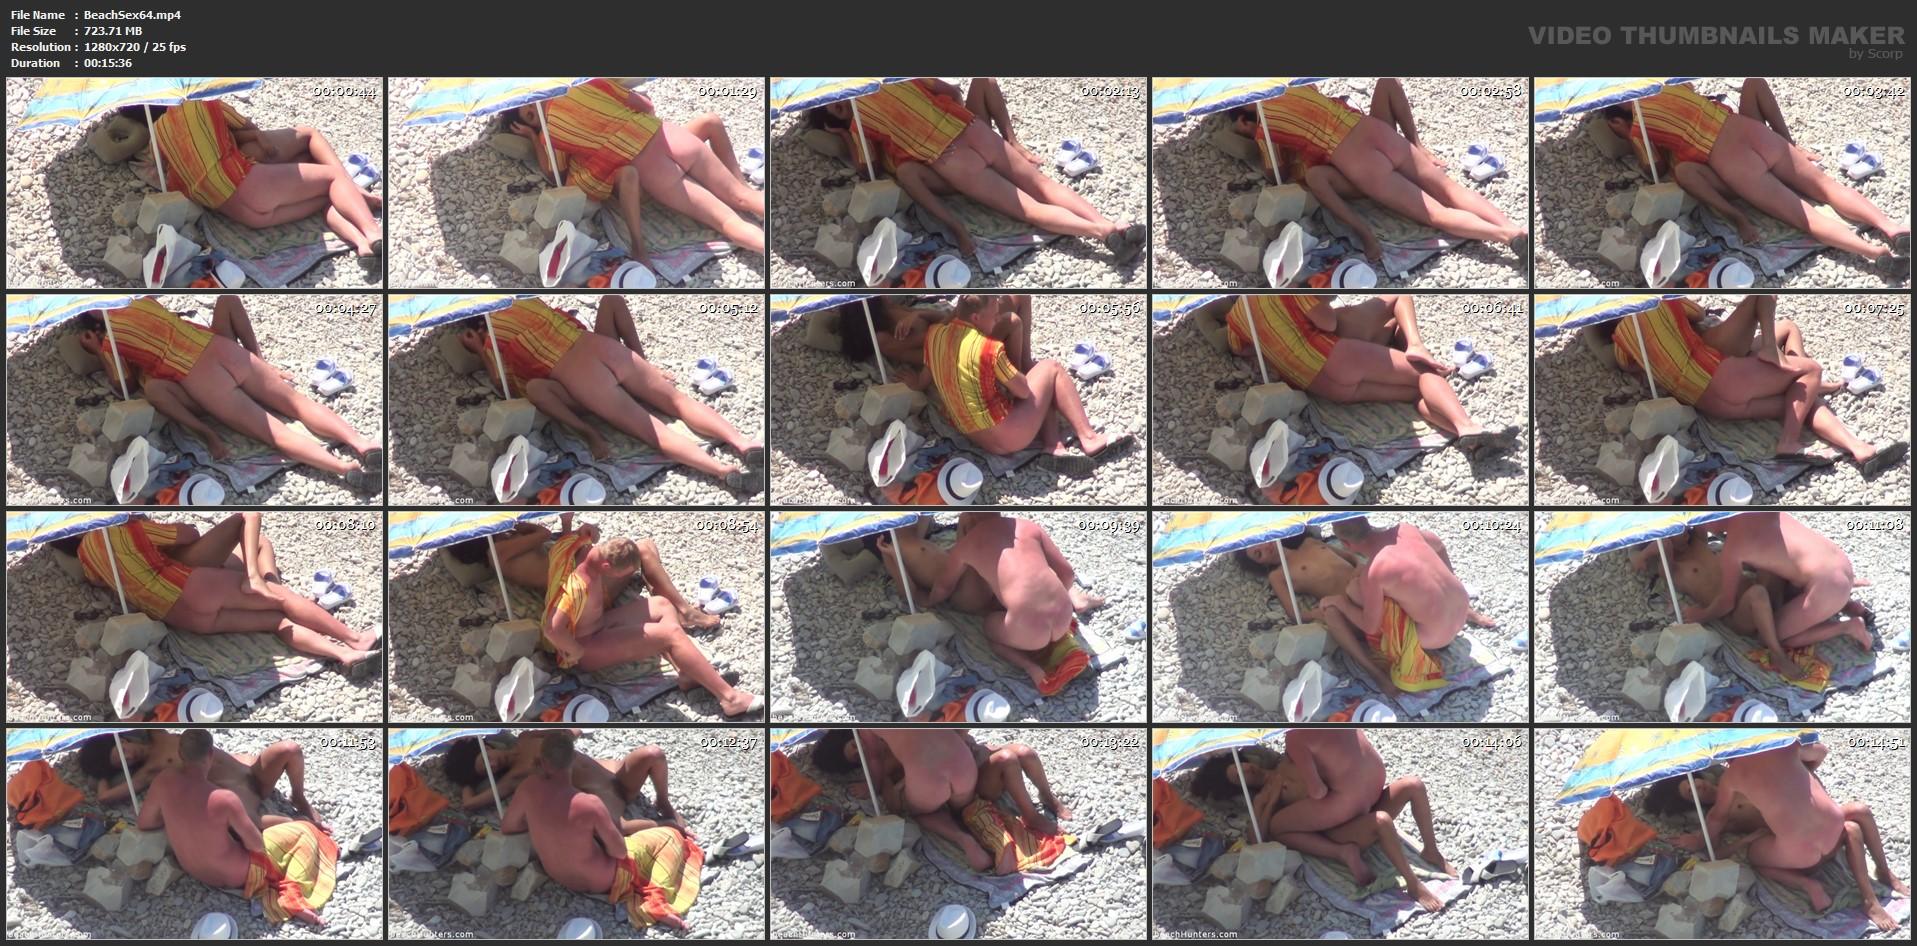 beachsex64-mp4